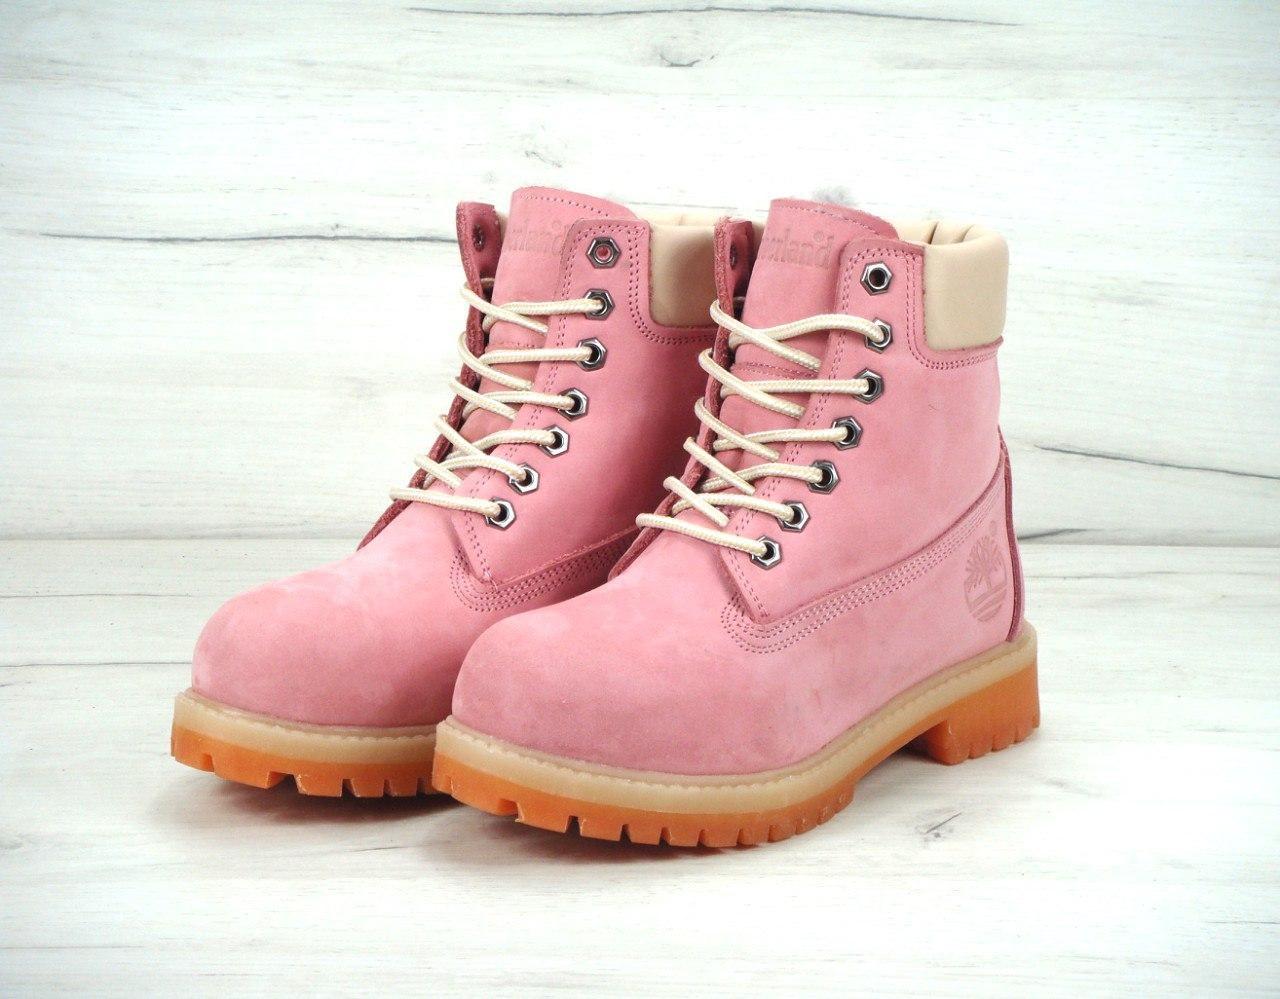 dd580eba Зимние ботинки женские с мехом Timberland 6 Inch Pink Реплика ...